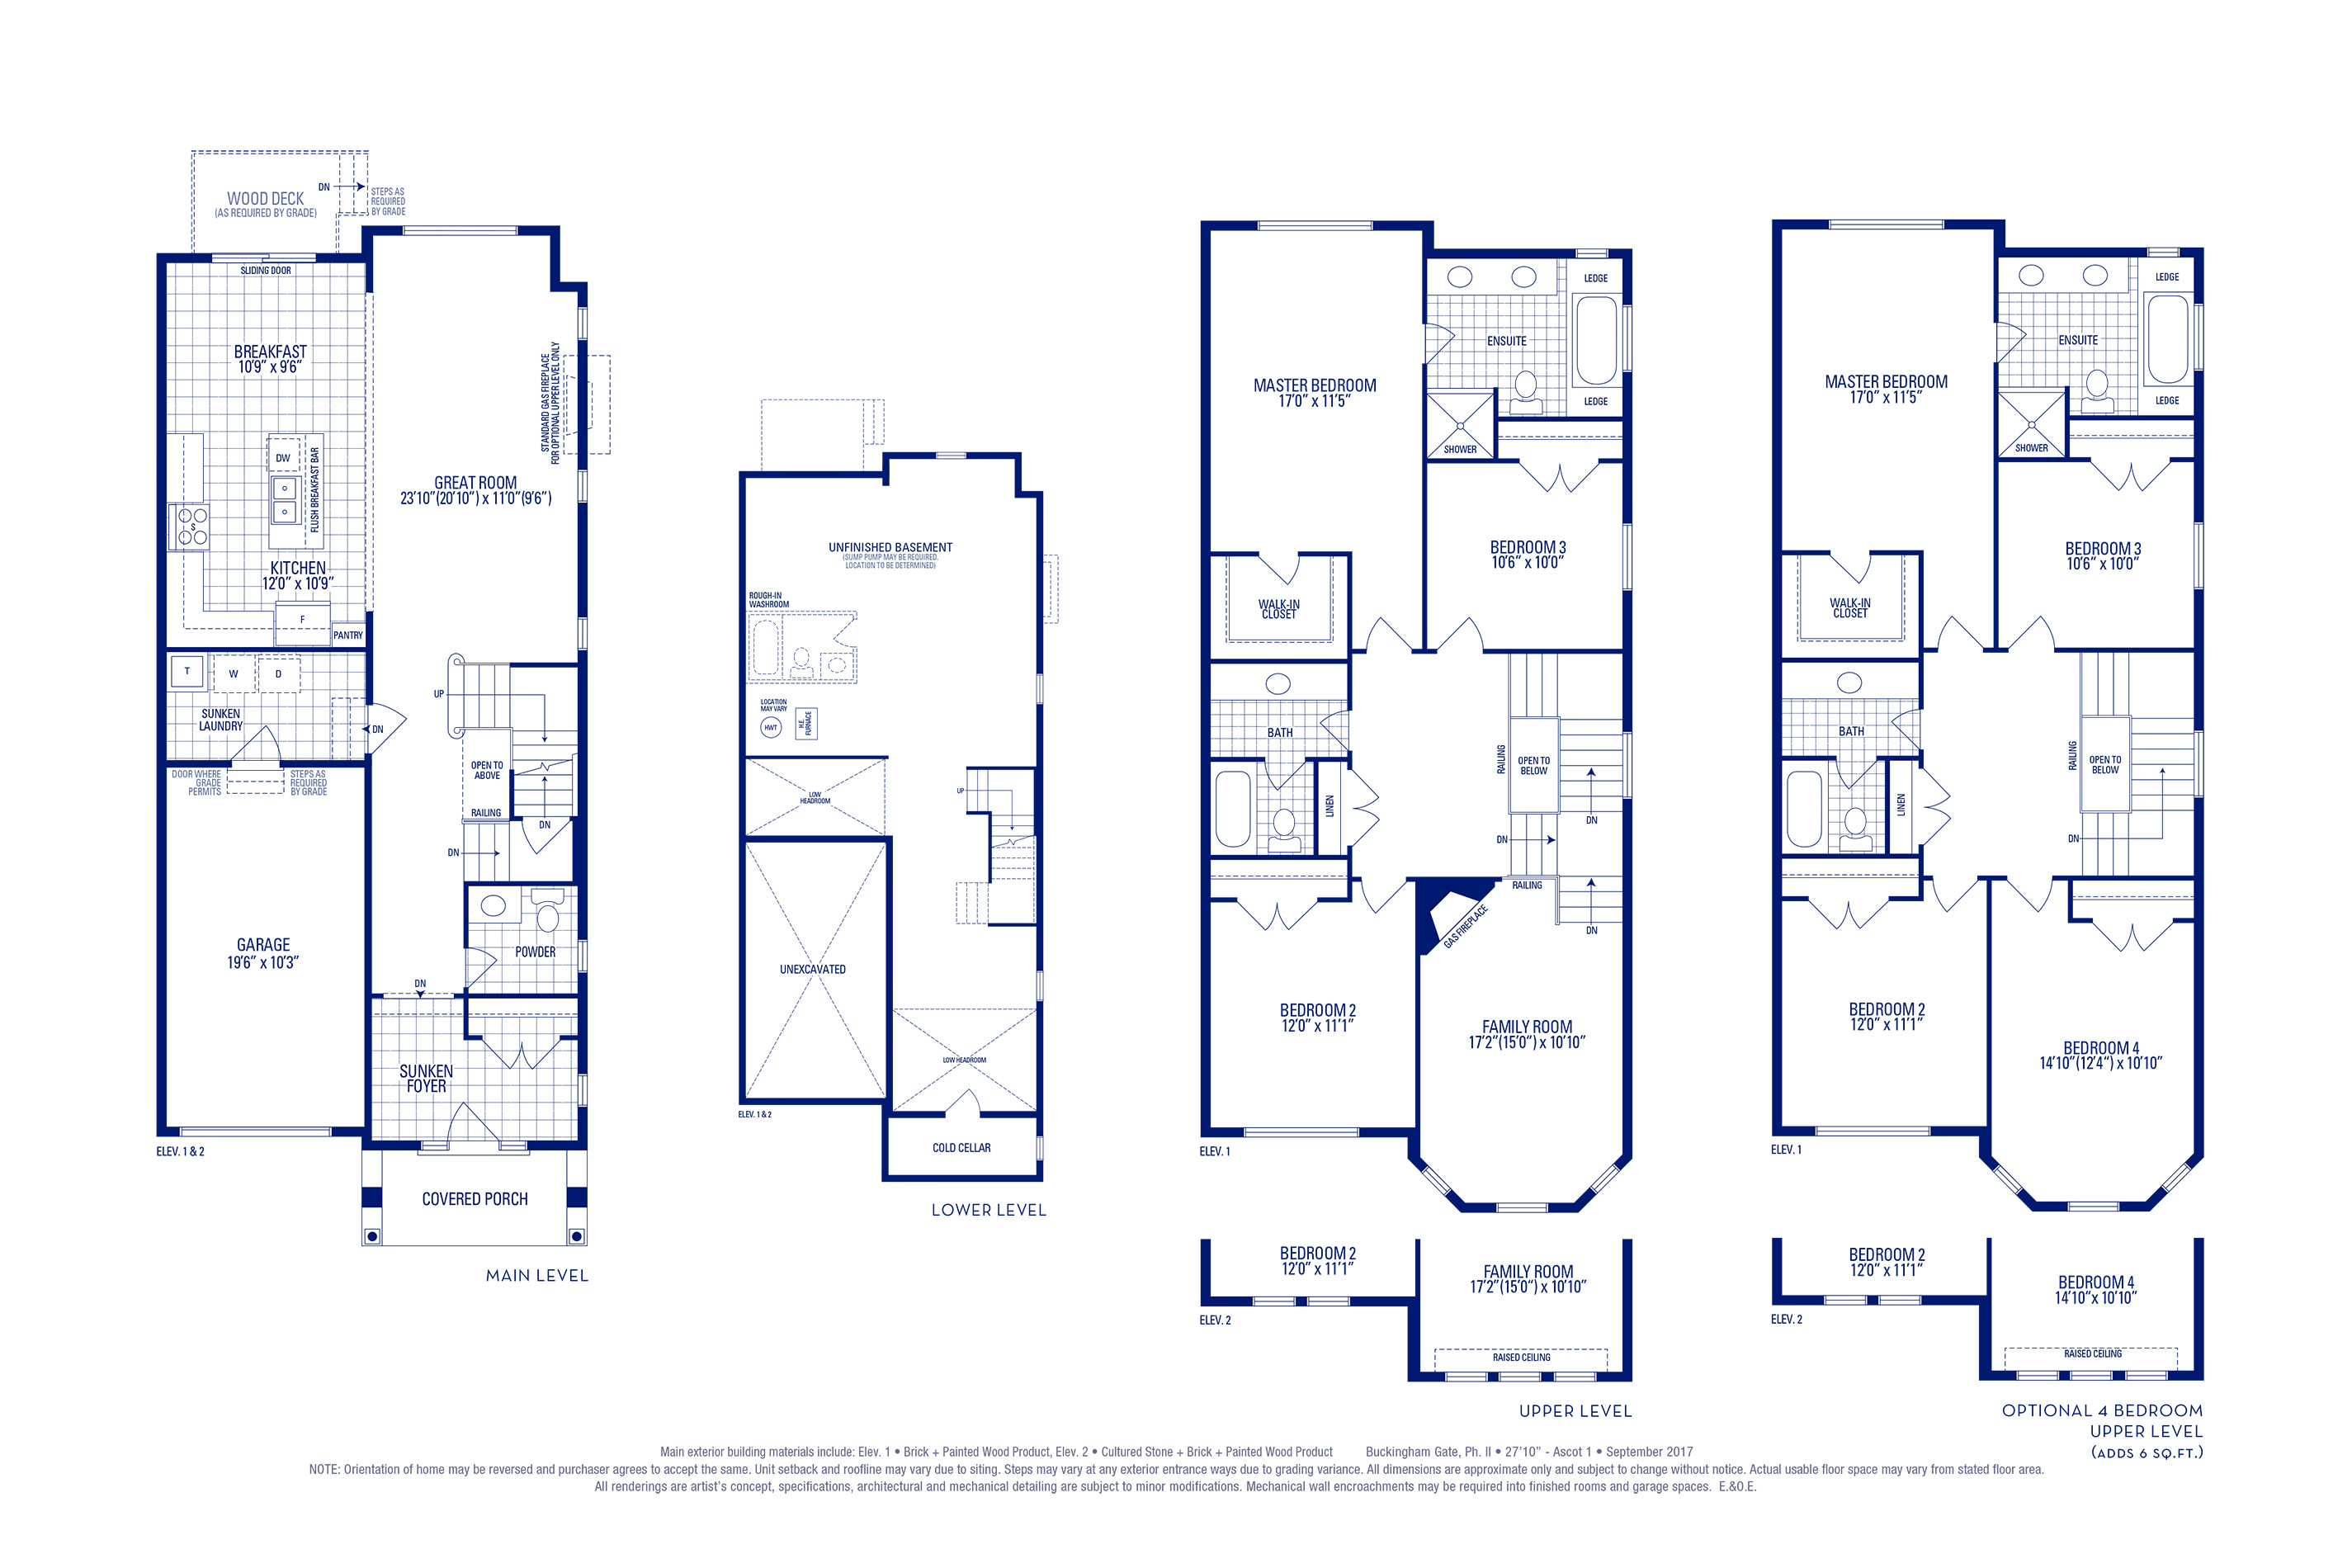 Ascot 01 Elev. 1 Floorplan